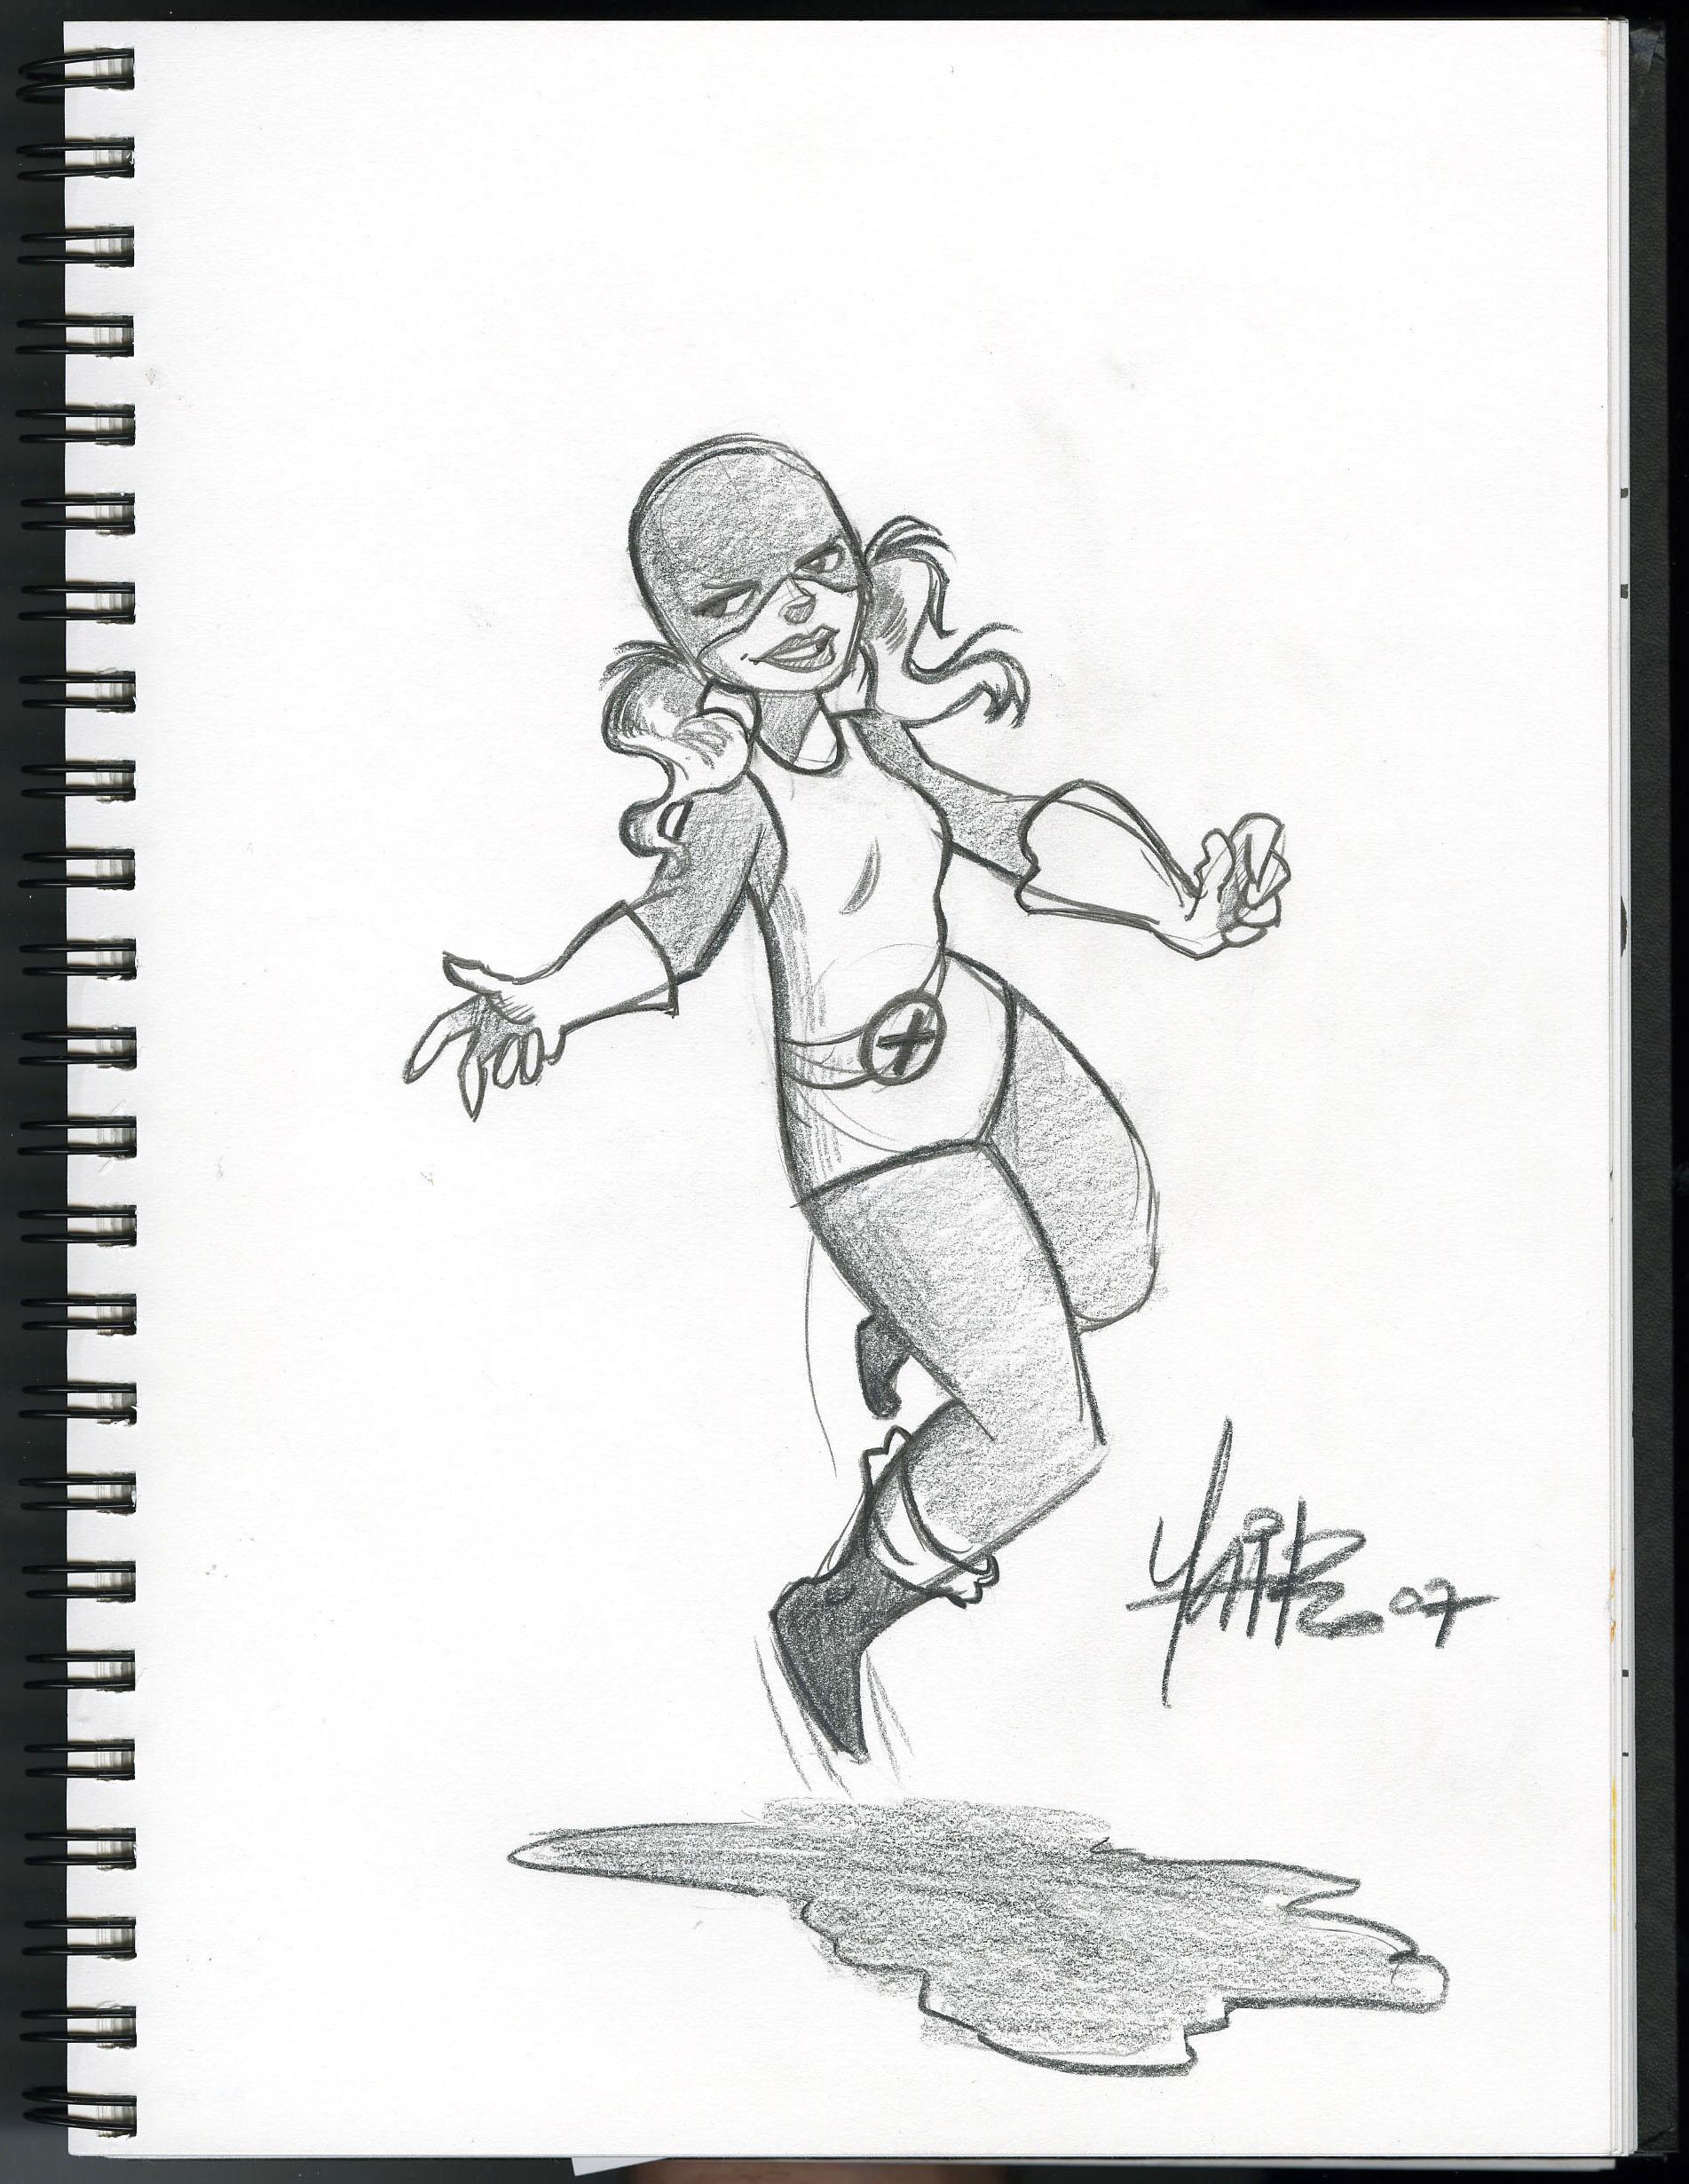 Jim Lee Catwoman Sketch